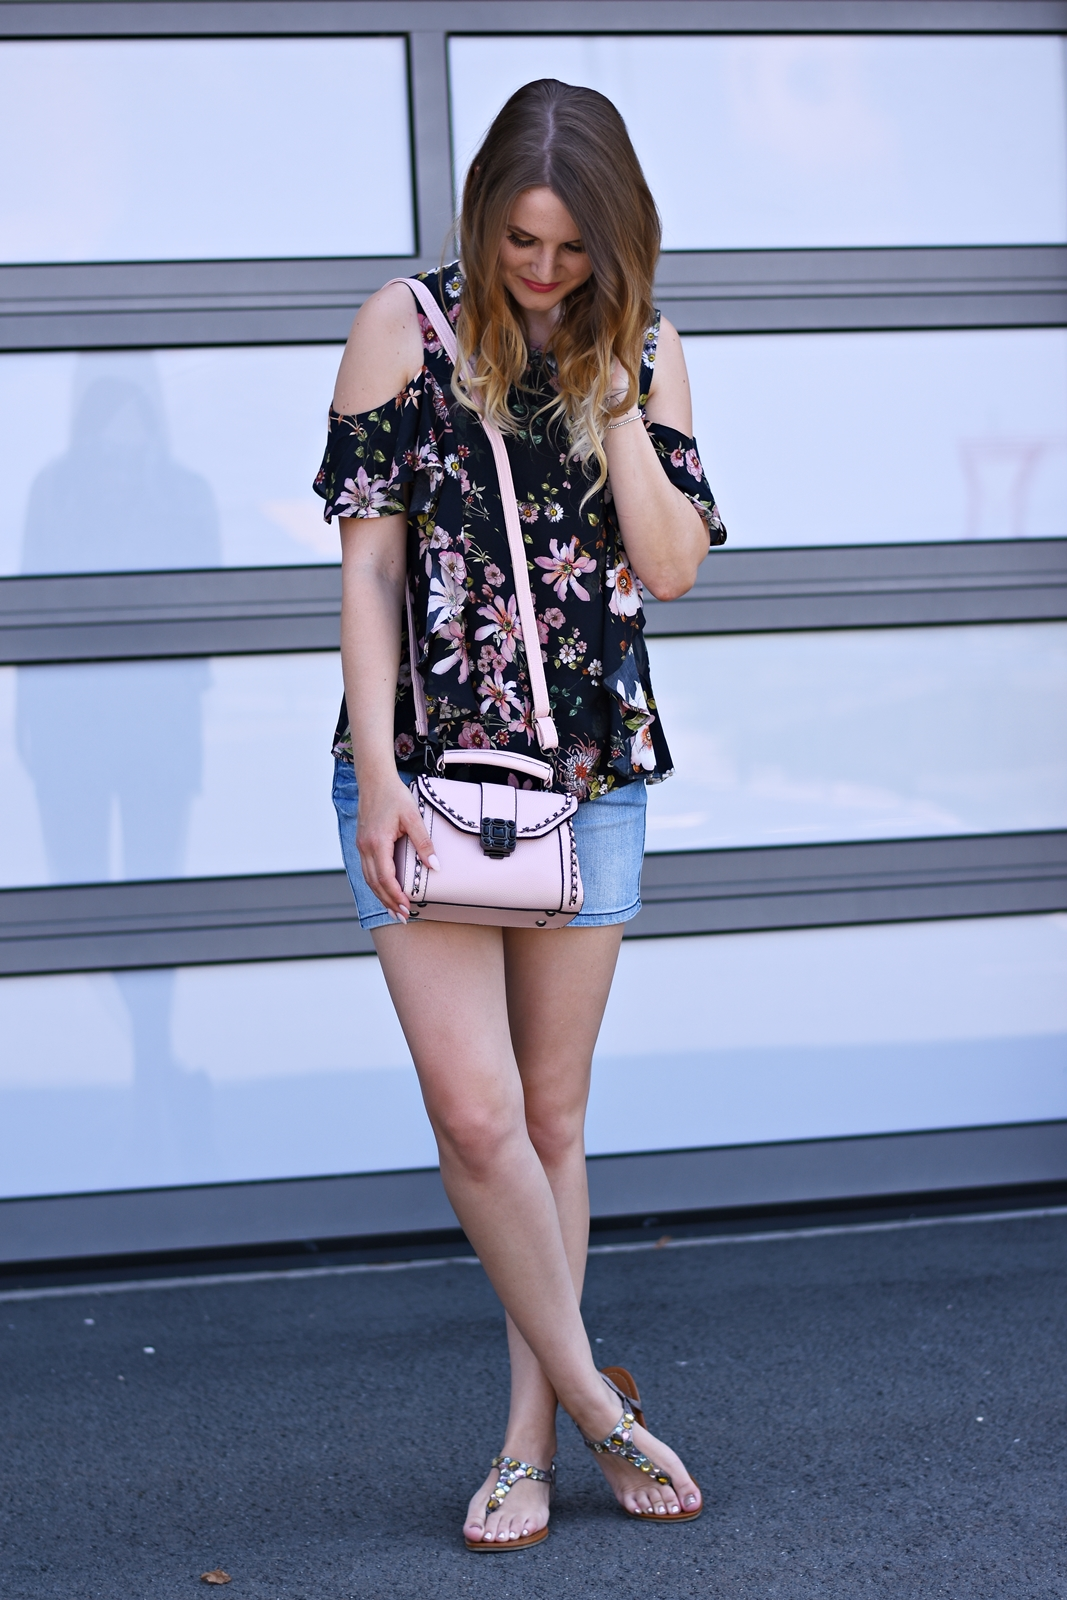 Jeansrock der Sommertrend - Streetstyle - Mode - Fashion - Trends - Blumenprint Bluse - Rosa Tasche - Fashionladyloves by Tamara Wagner Fashionblog